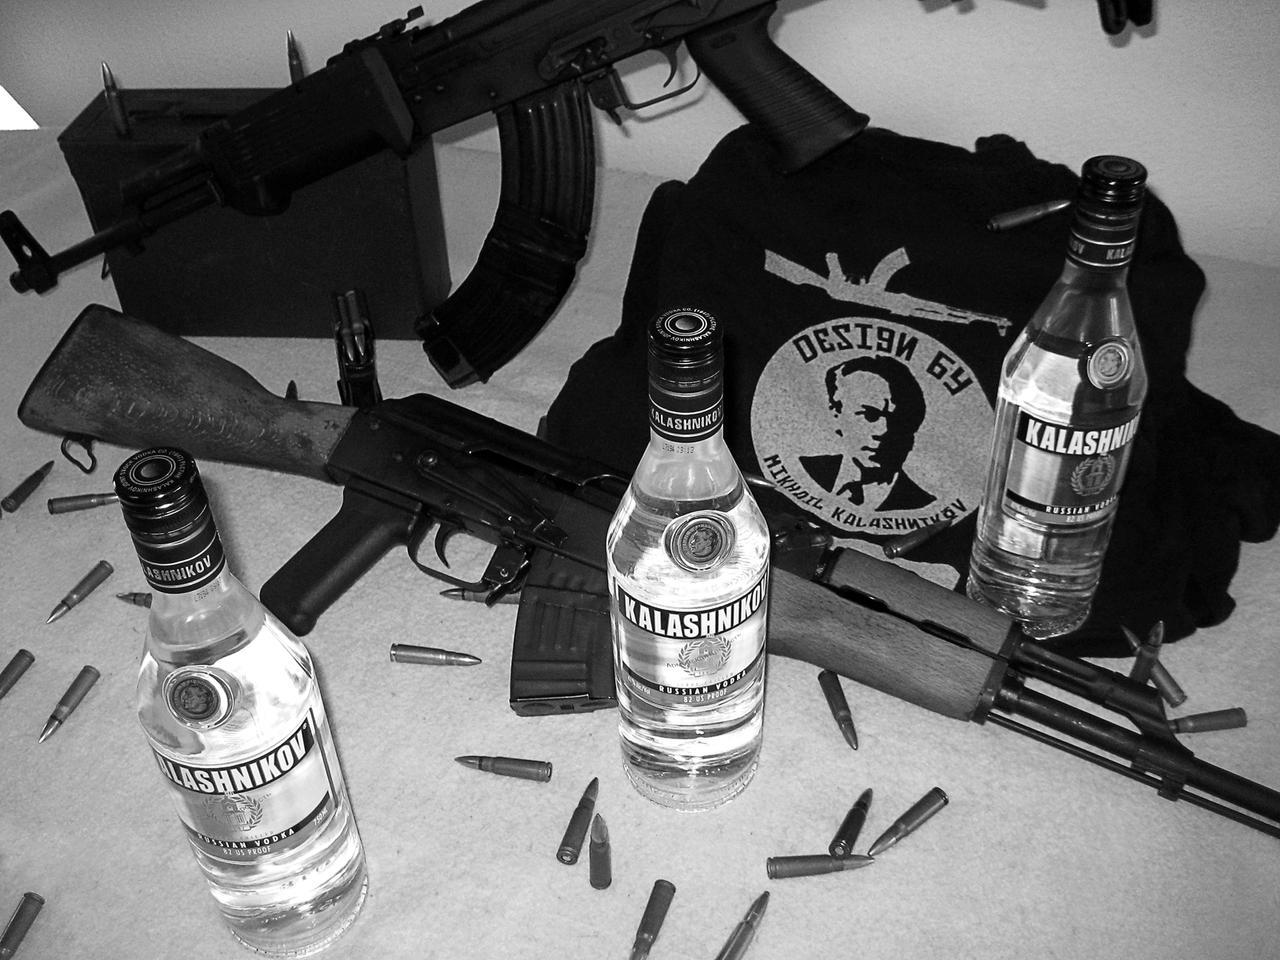 A Tribute to Kalashnikov by samuelkowal906